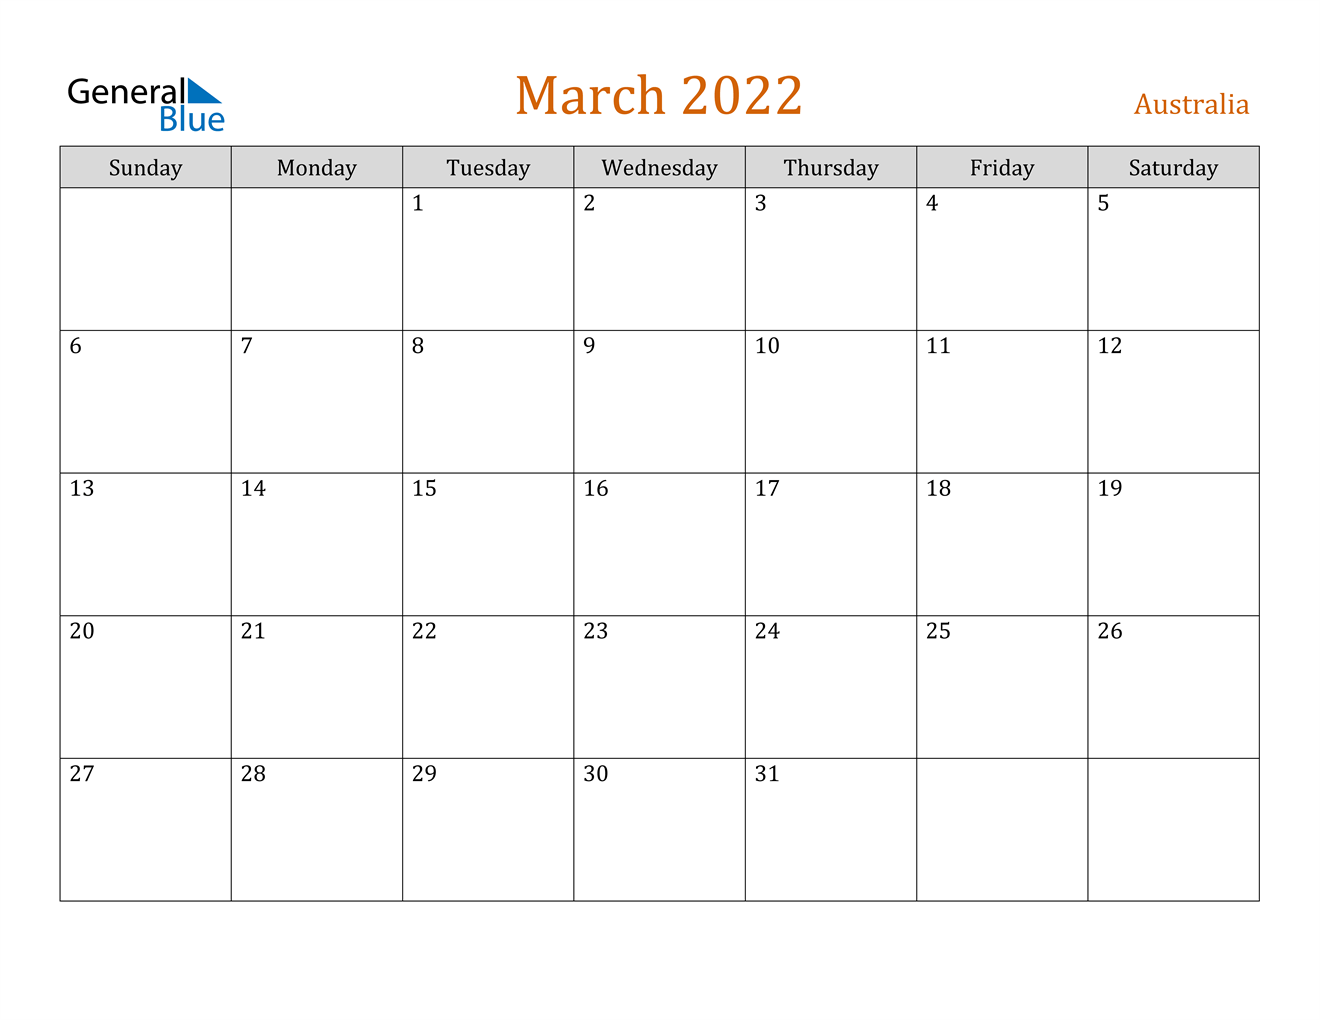 March 2022 Calendar - Australia